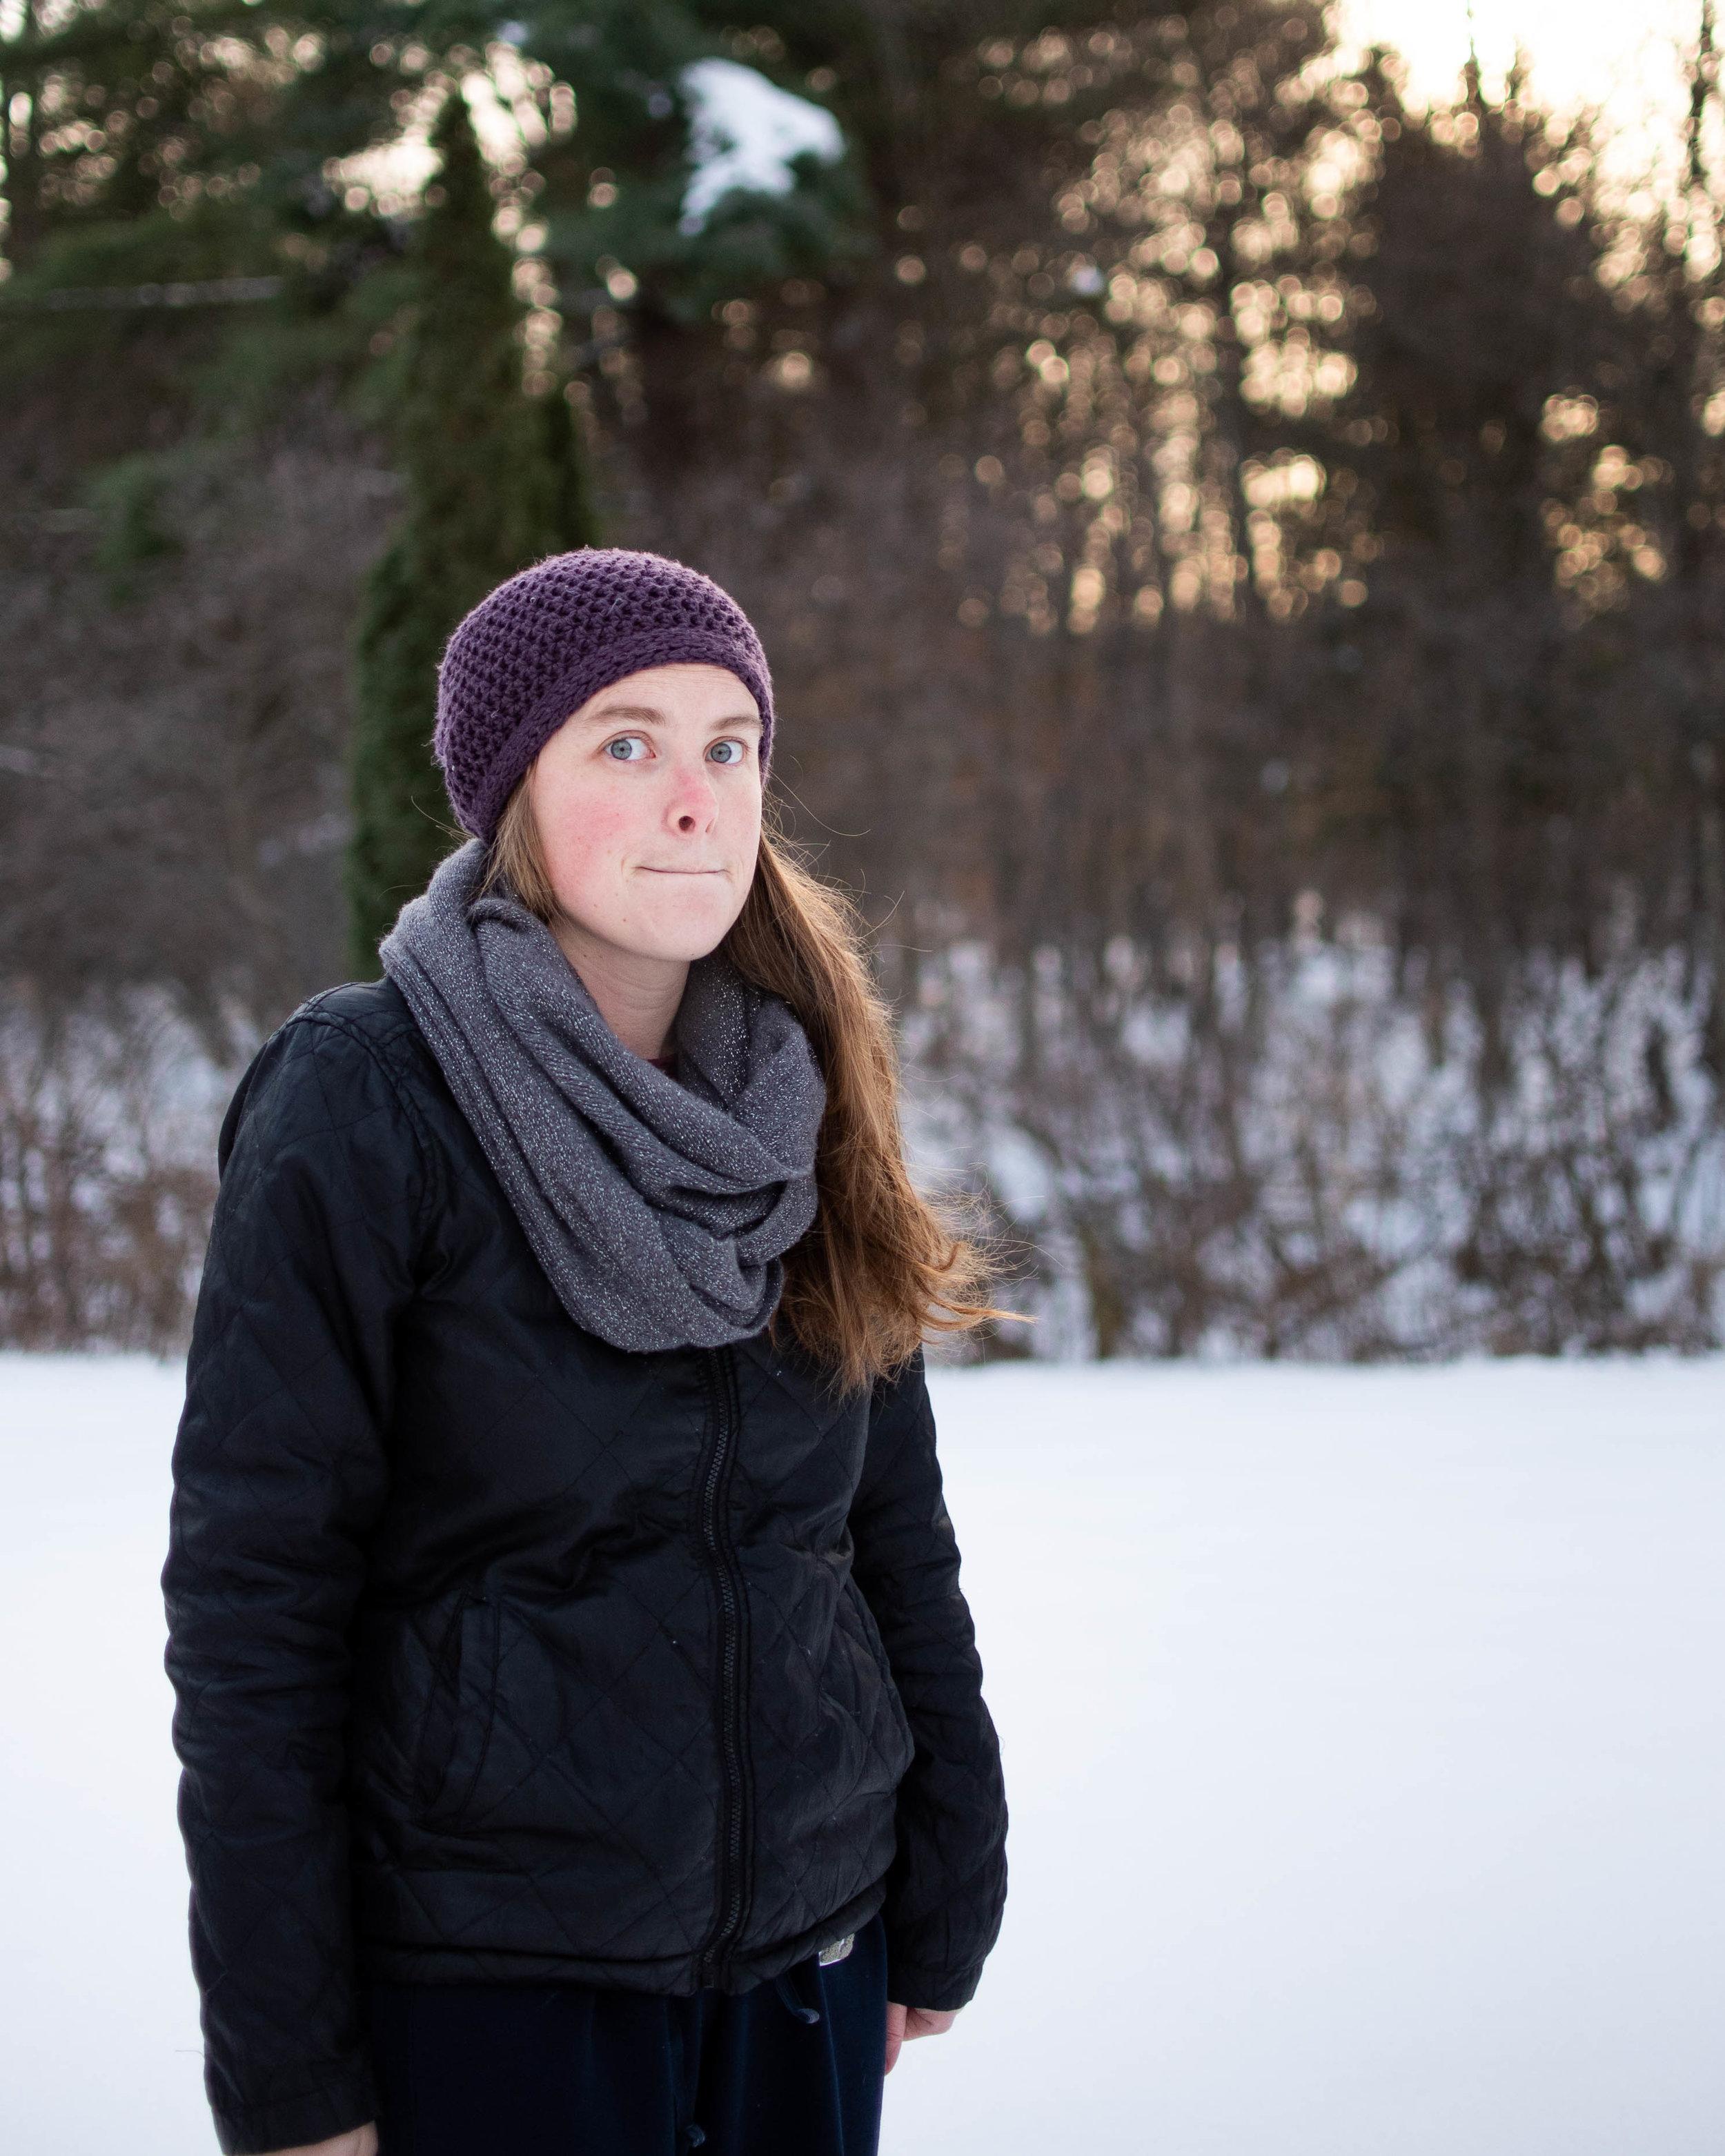 moriah hounsell winter portrait